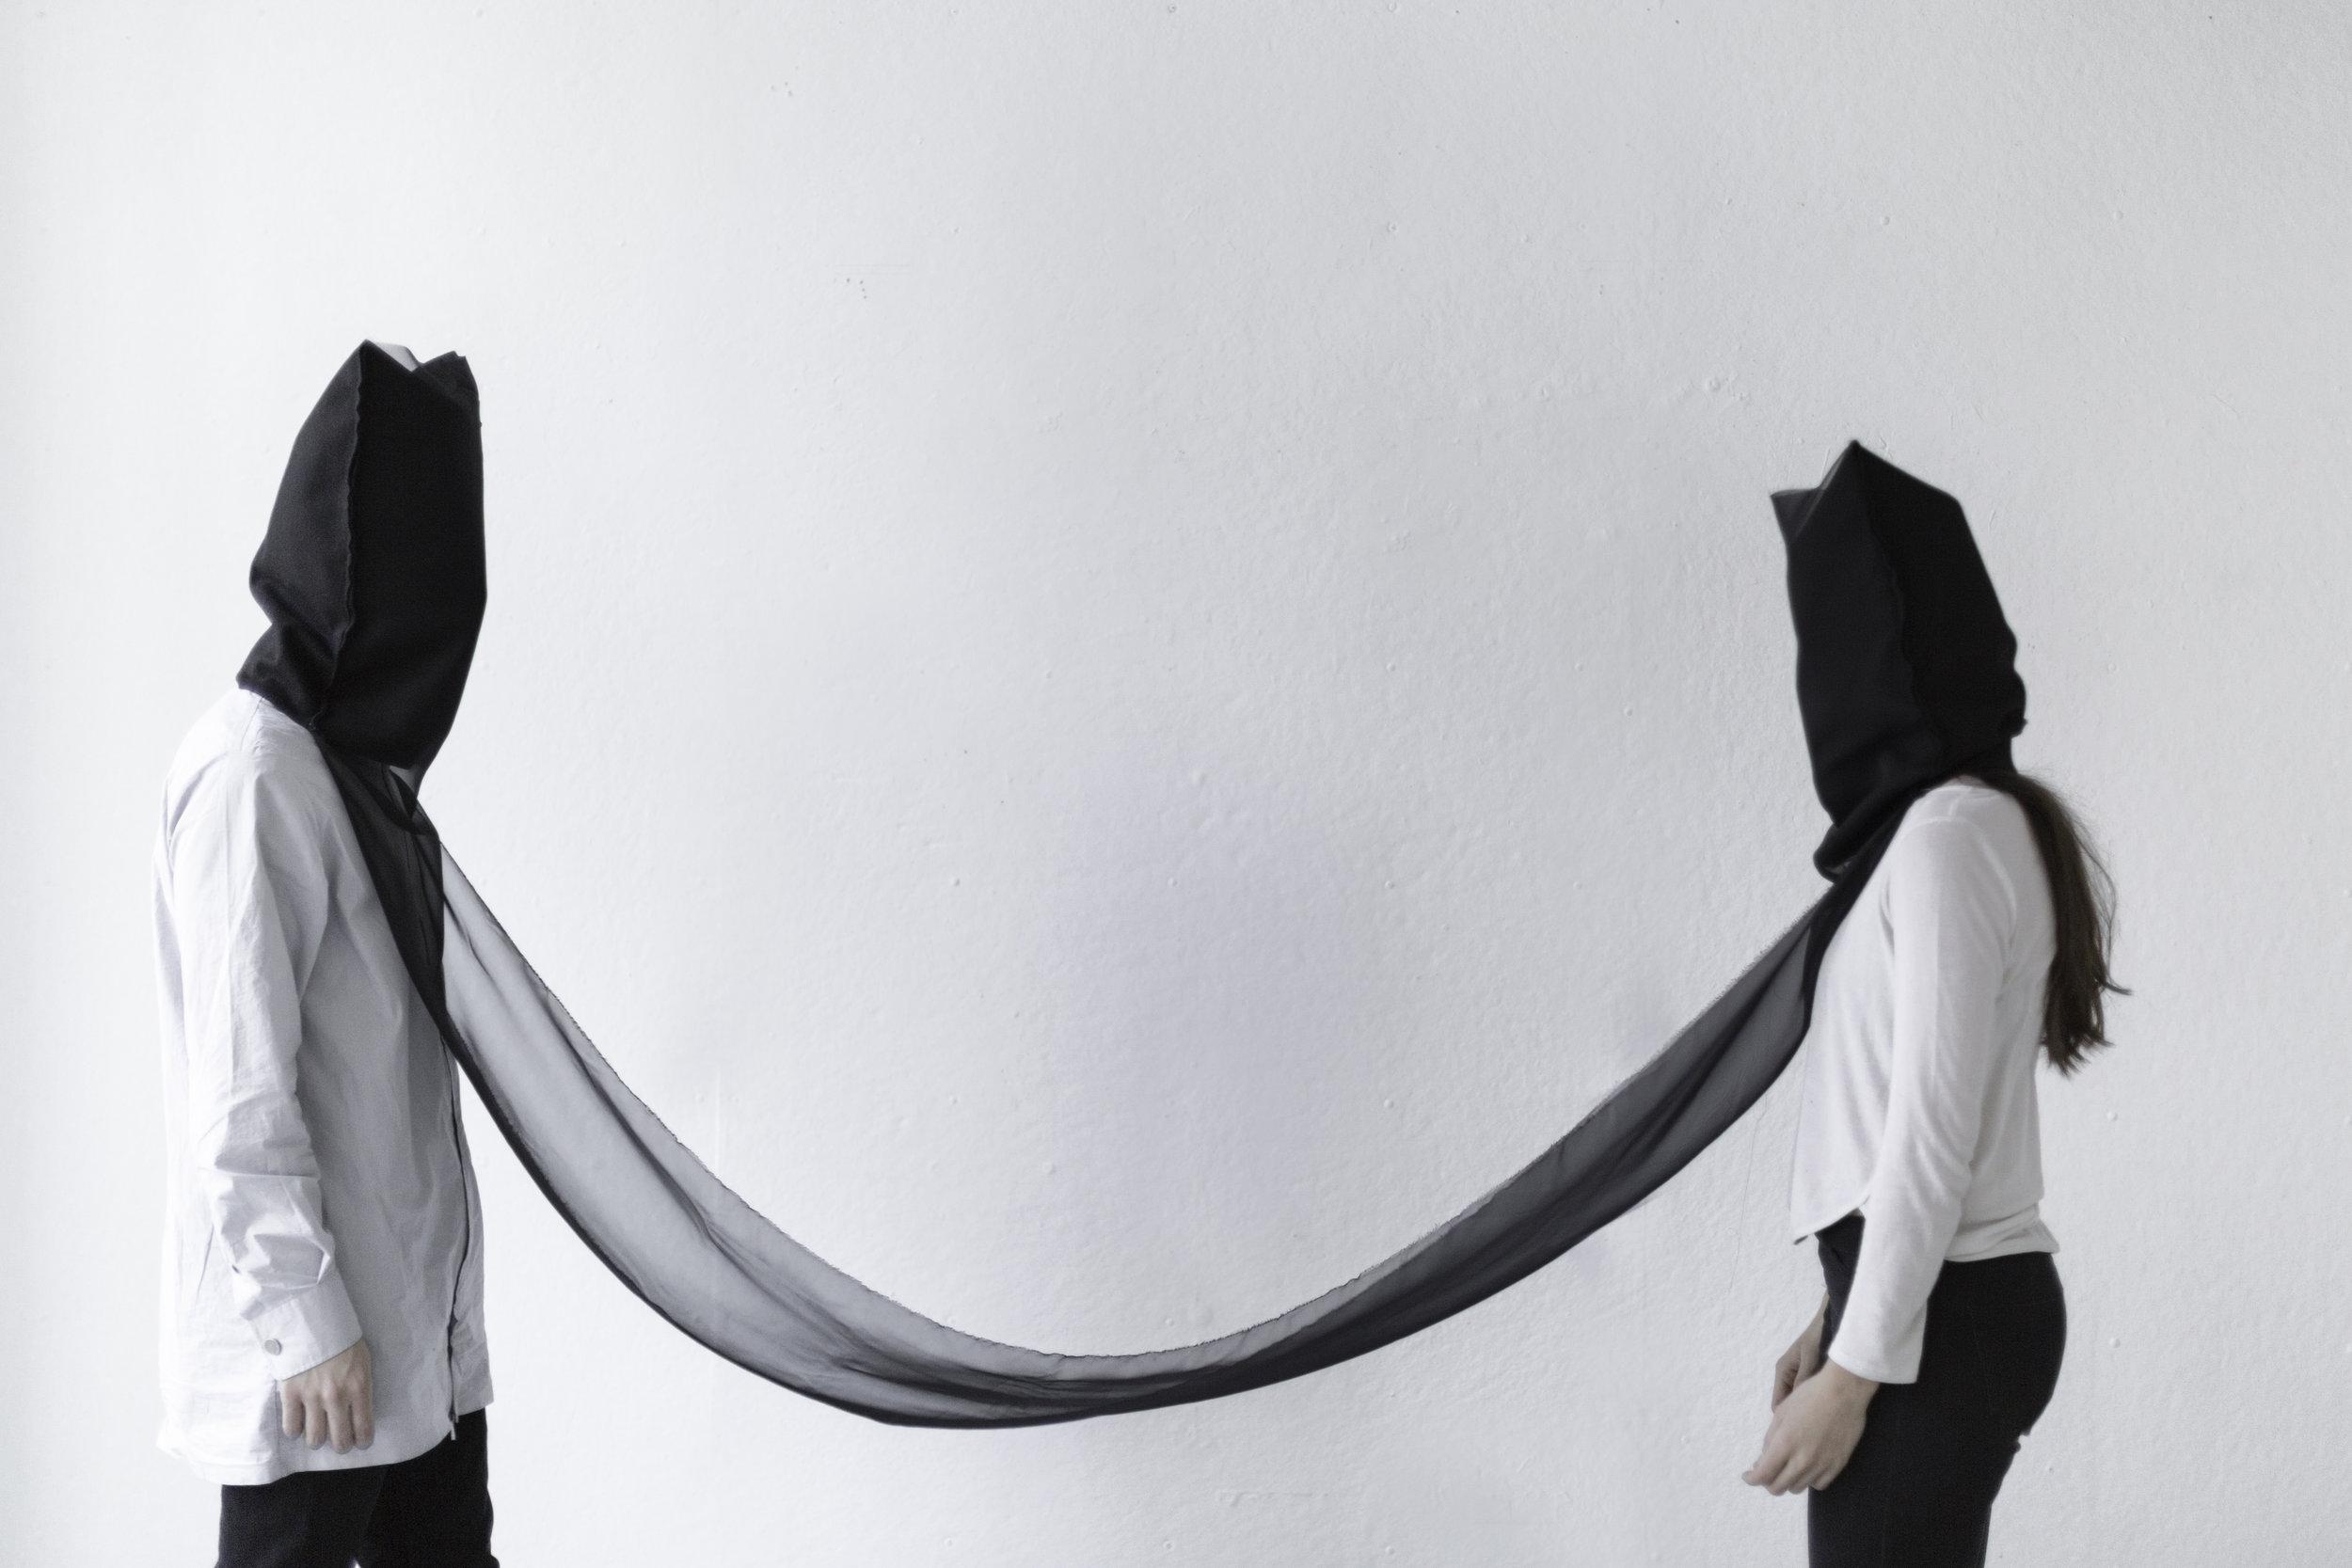 Prisoners of (Mourning). Thread, felt, and chiffon fabric. M Bohrer.